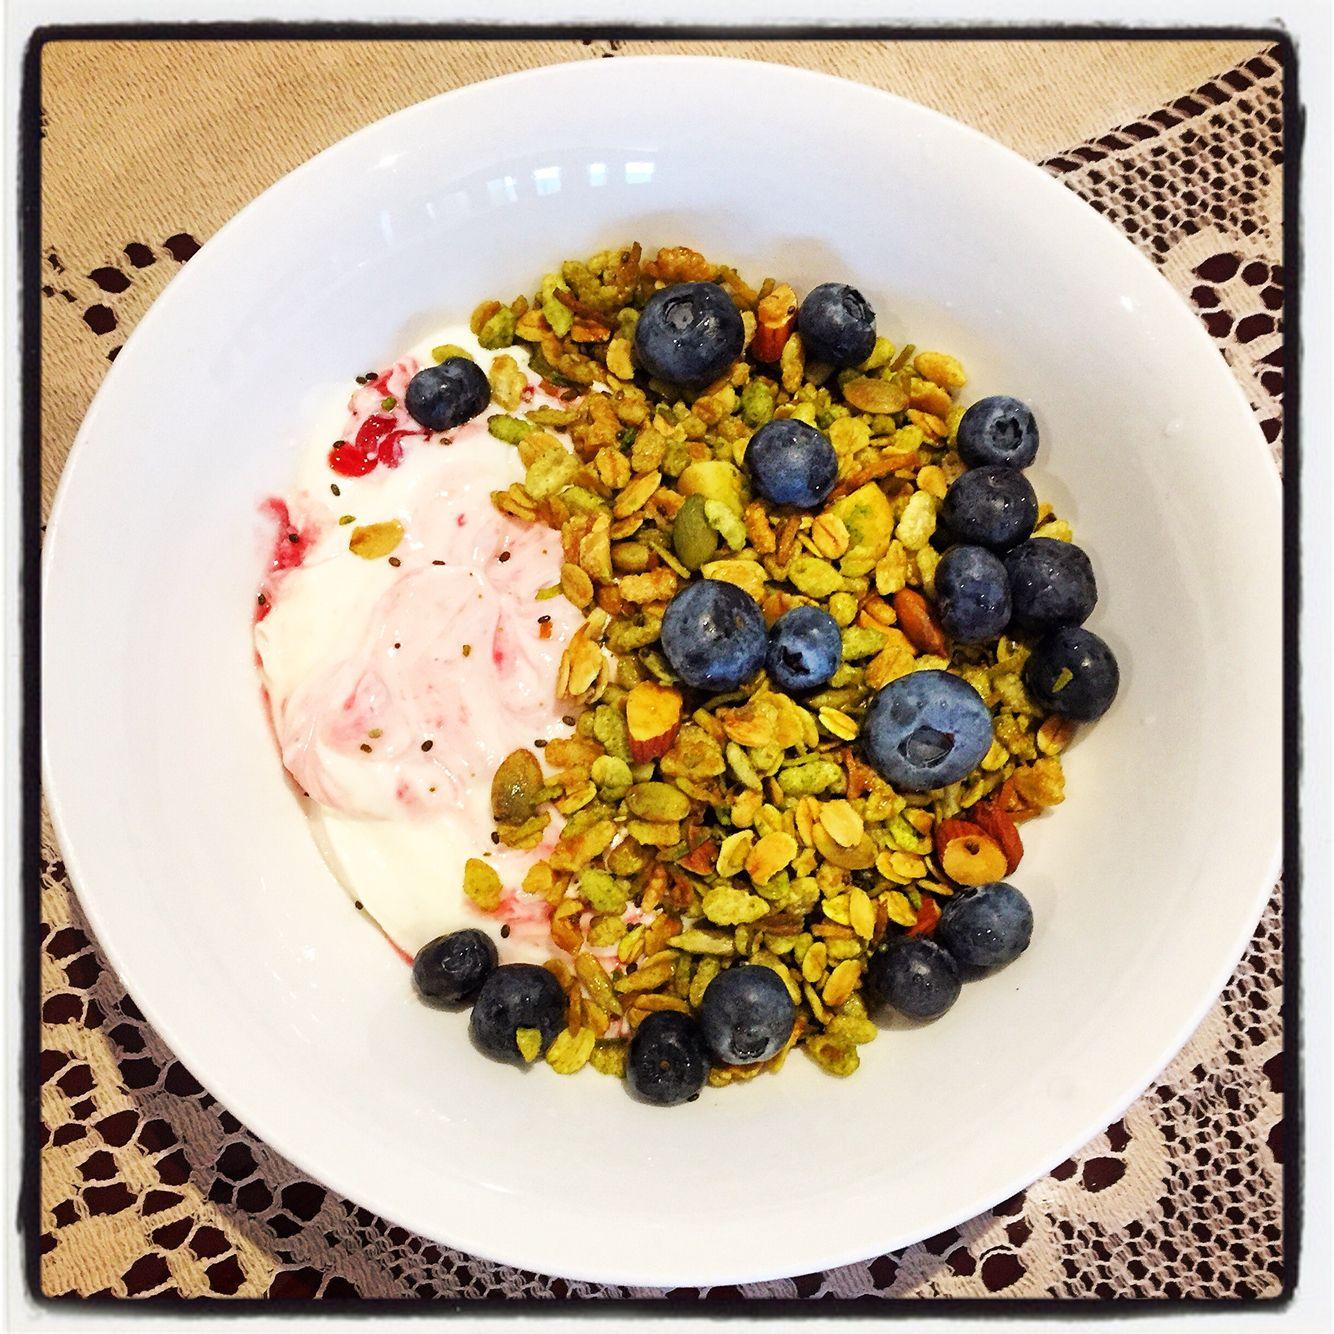 Homemade Matcha Muesli w Blueberries & Gippsland Watermelon & Strawberry Yoghurt  #mealforameal #instafood #foodpic #foodelicious #muesli #matcha #greentea  #gippslanddairy #matchamuesli #watermelonandstrawberrytwist #almond #walnut #macadima #sunfloweseeds #pumpkinseeds #blueberry #maplesyrup #vanilla #brownsugar #coconut #chiaseed #yummygoodness #brekkie #breakfast #healthyeating